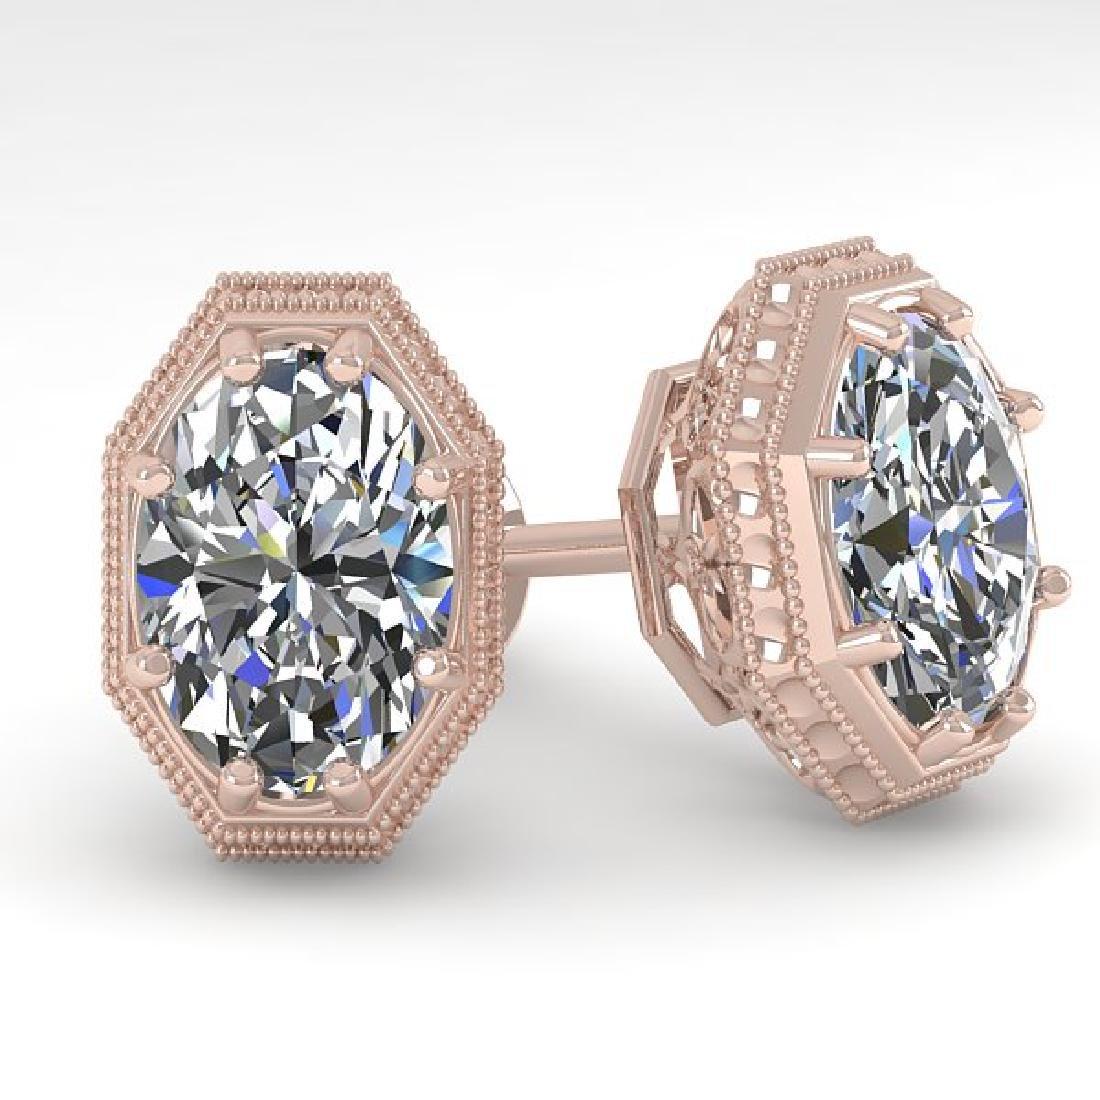 2.0 CTW VS/SI Oval Cut Diamond Stud Solitaire Earrings